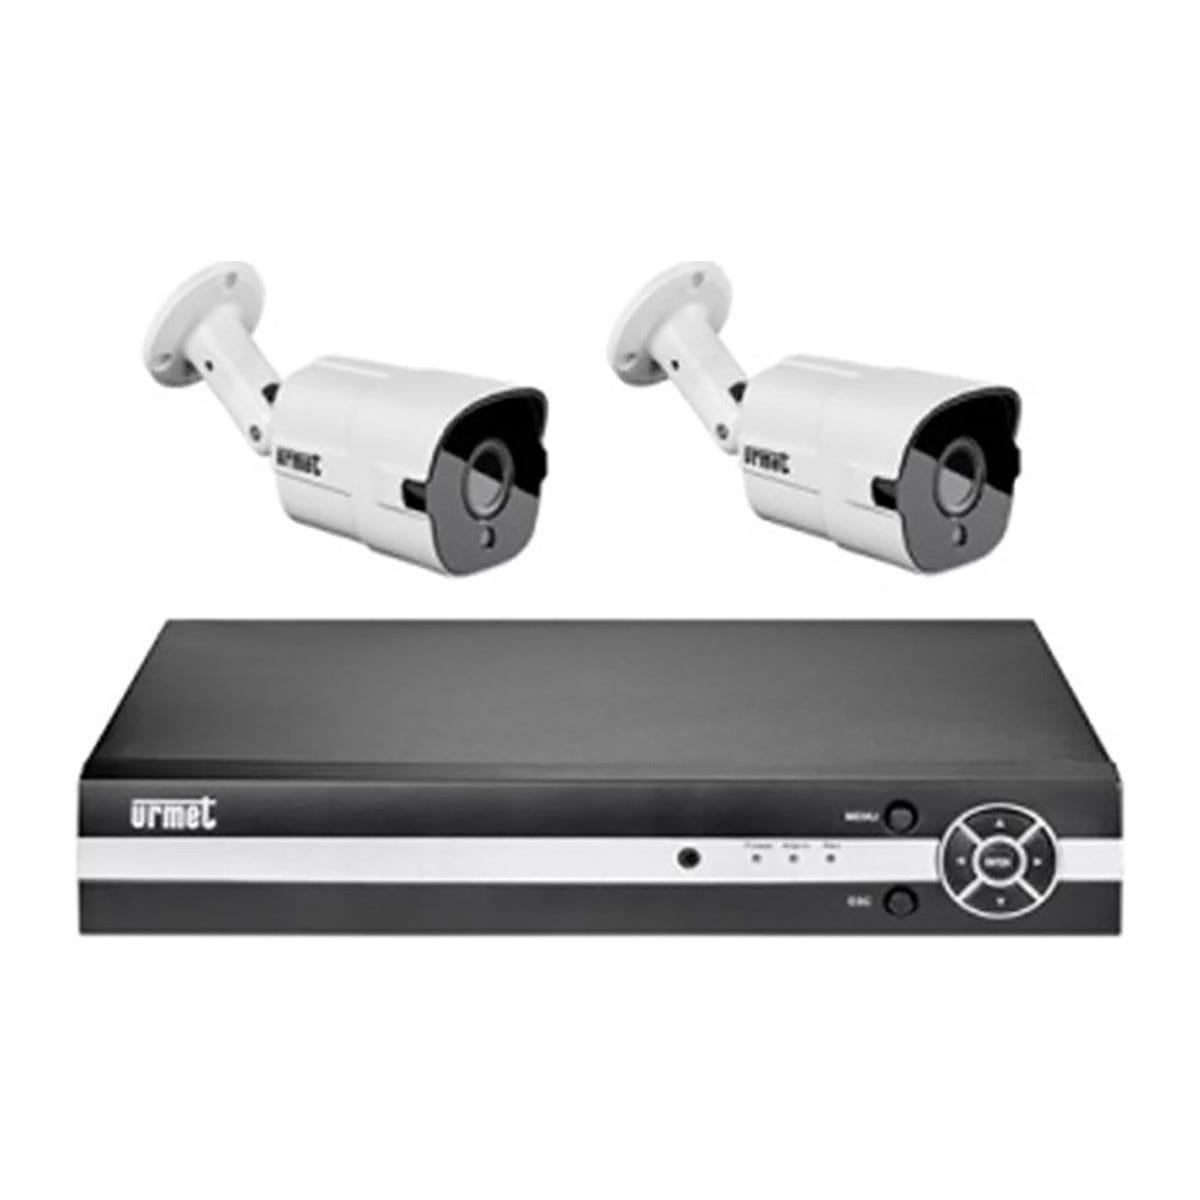 URMET Kit Videosorveglianza  Filare Ahd 4 Canali Due Telecamere 4 Mpx E Hard Disk Da 1 Tb